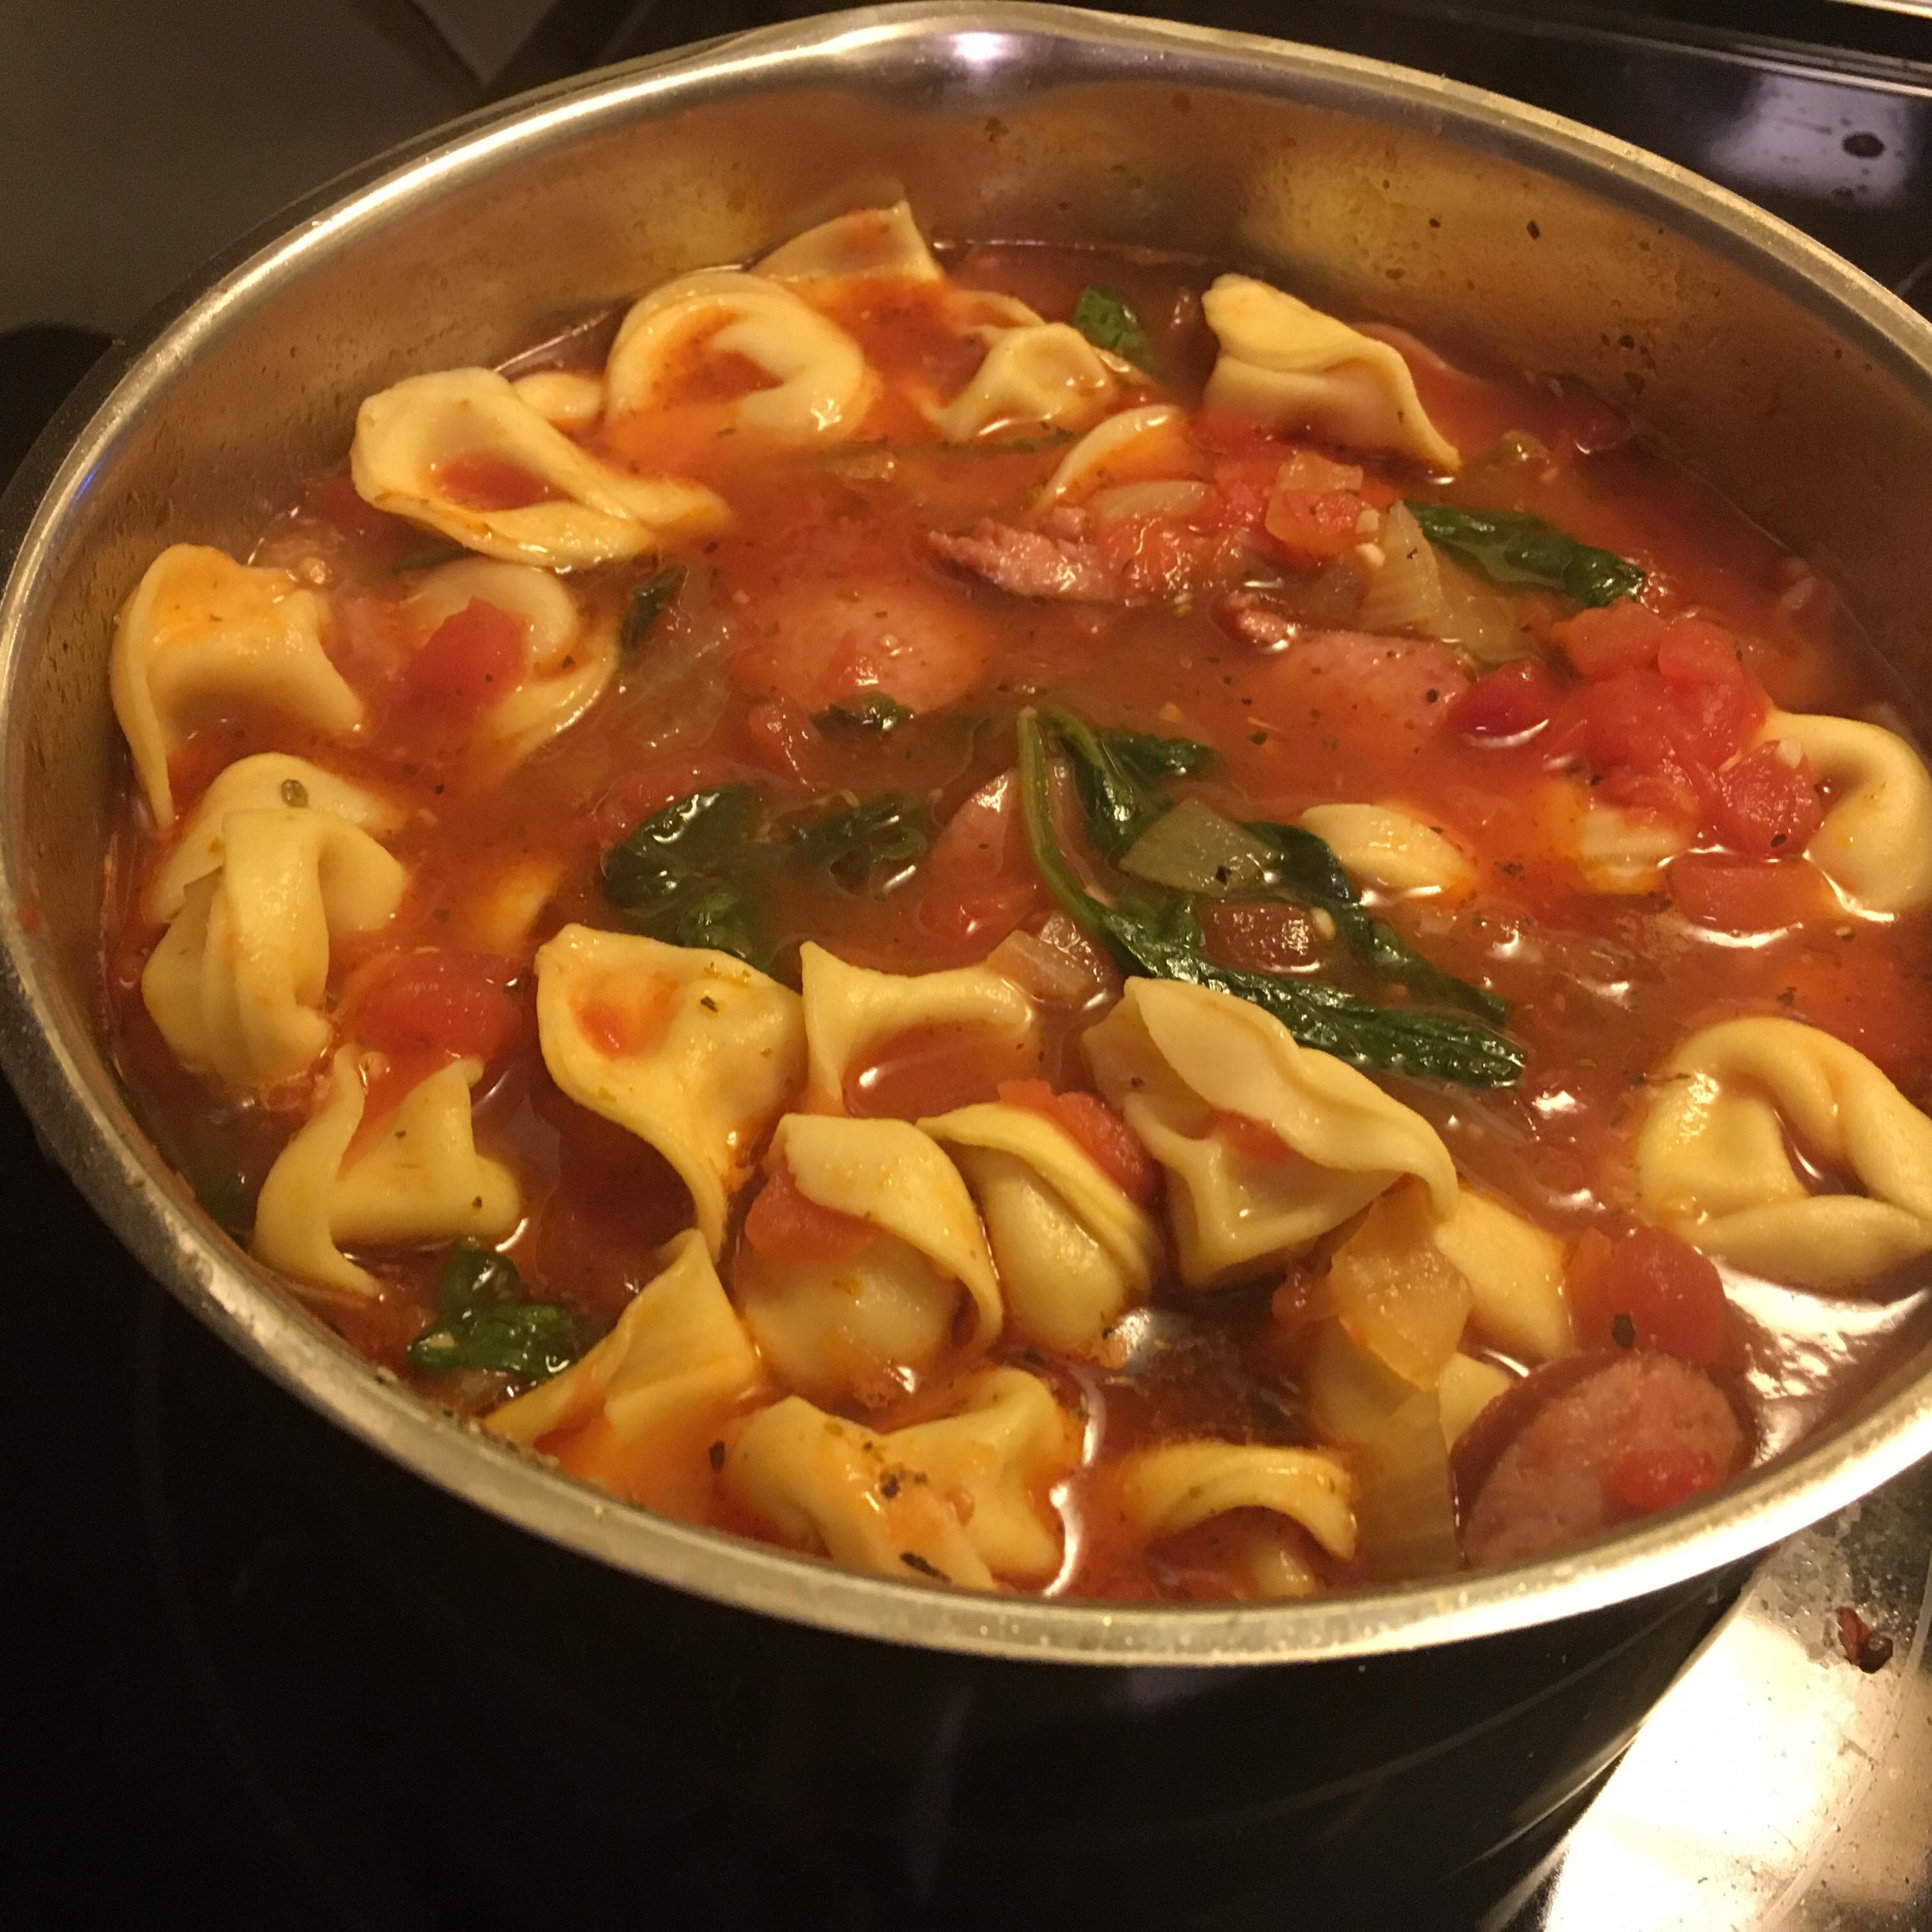 Smoked Sausage and Tortellini Soup homecookdad